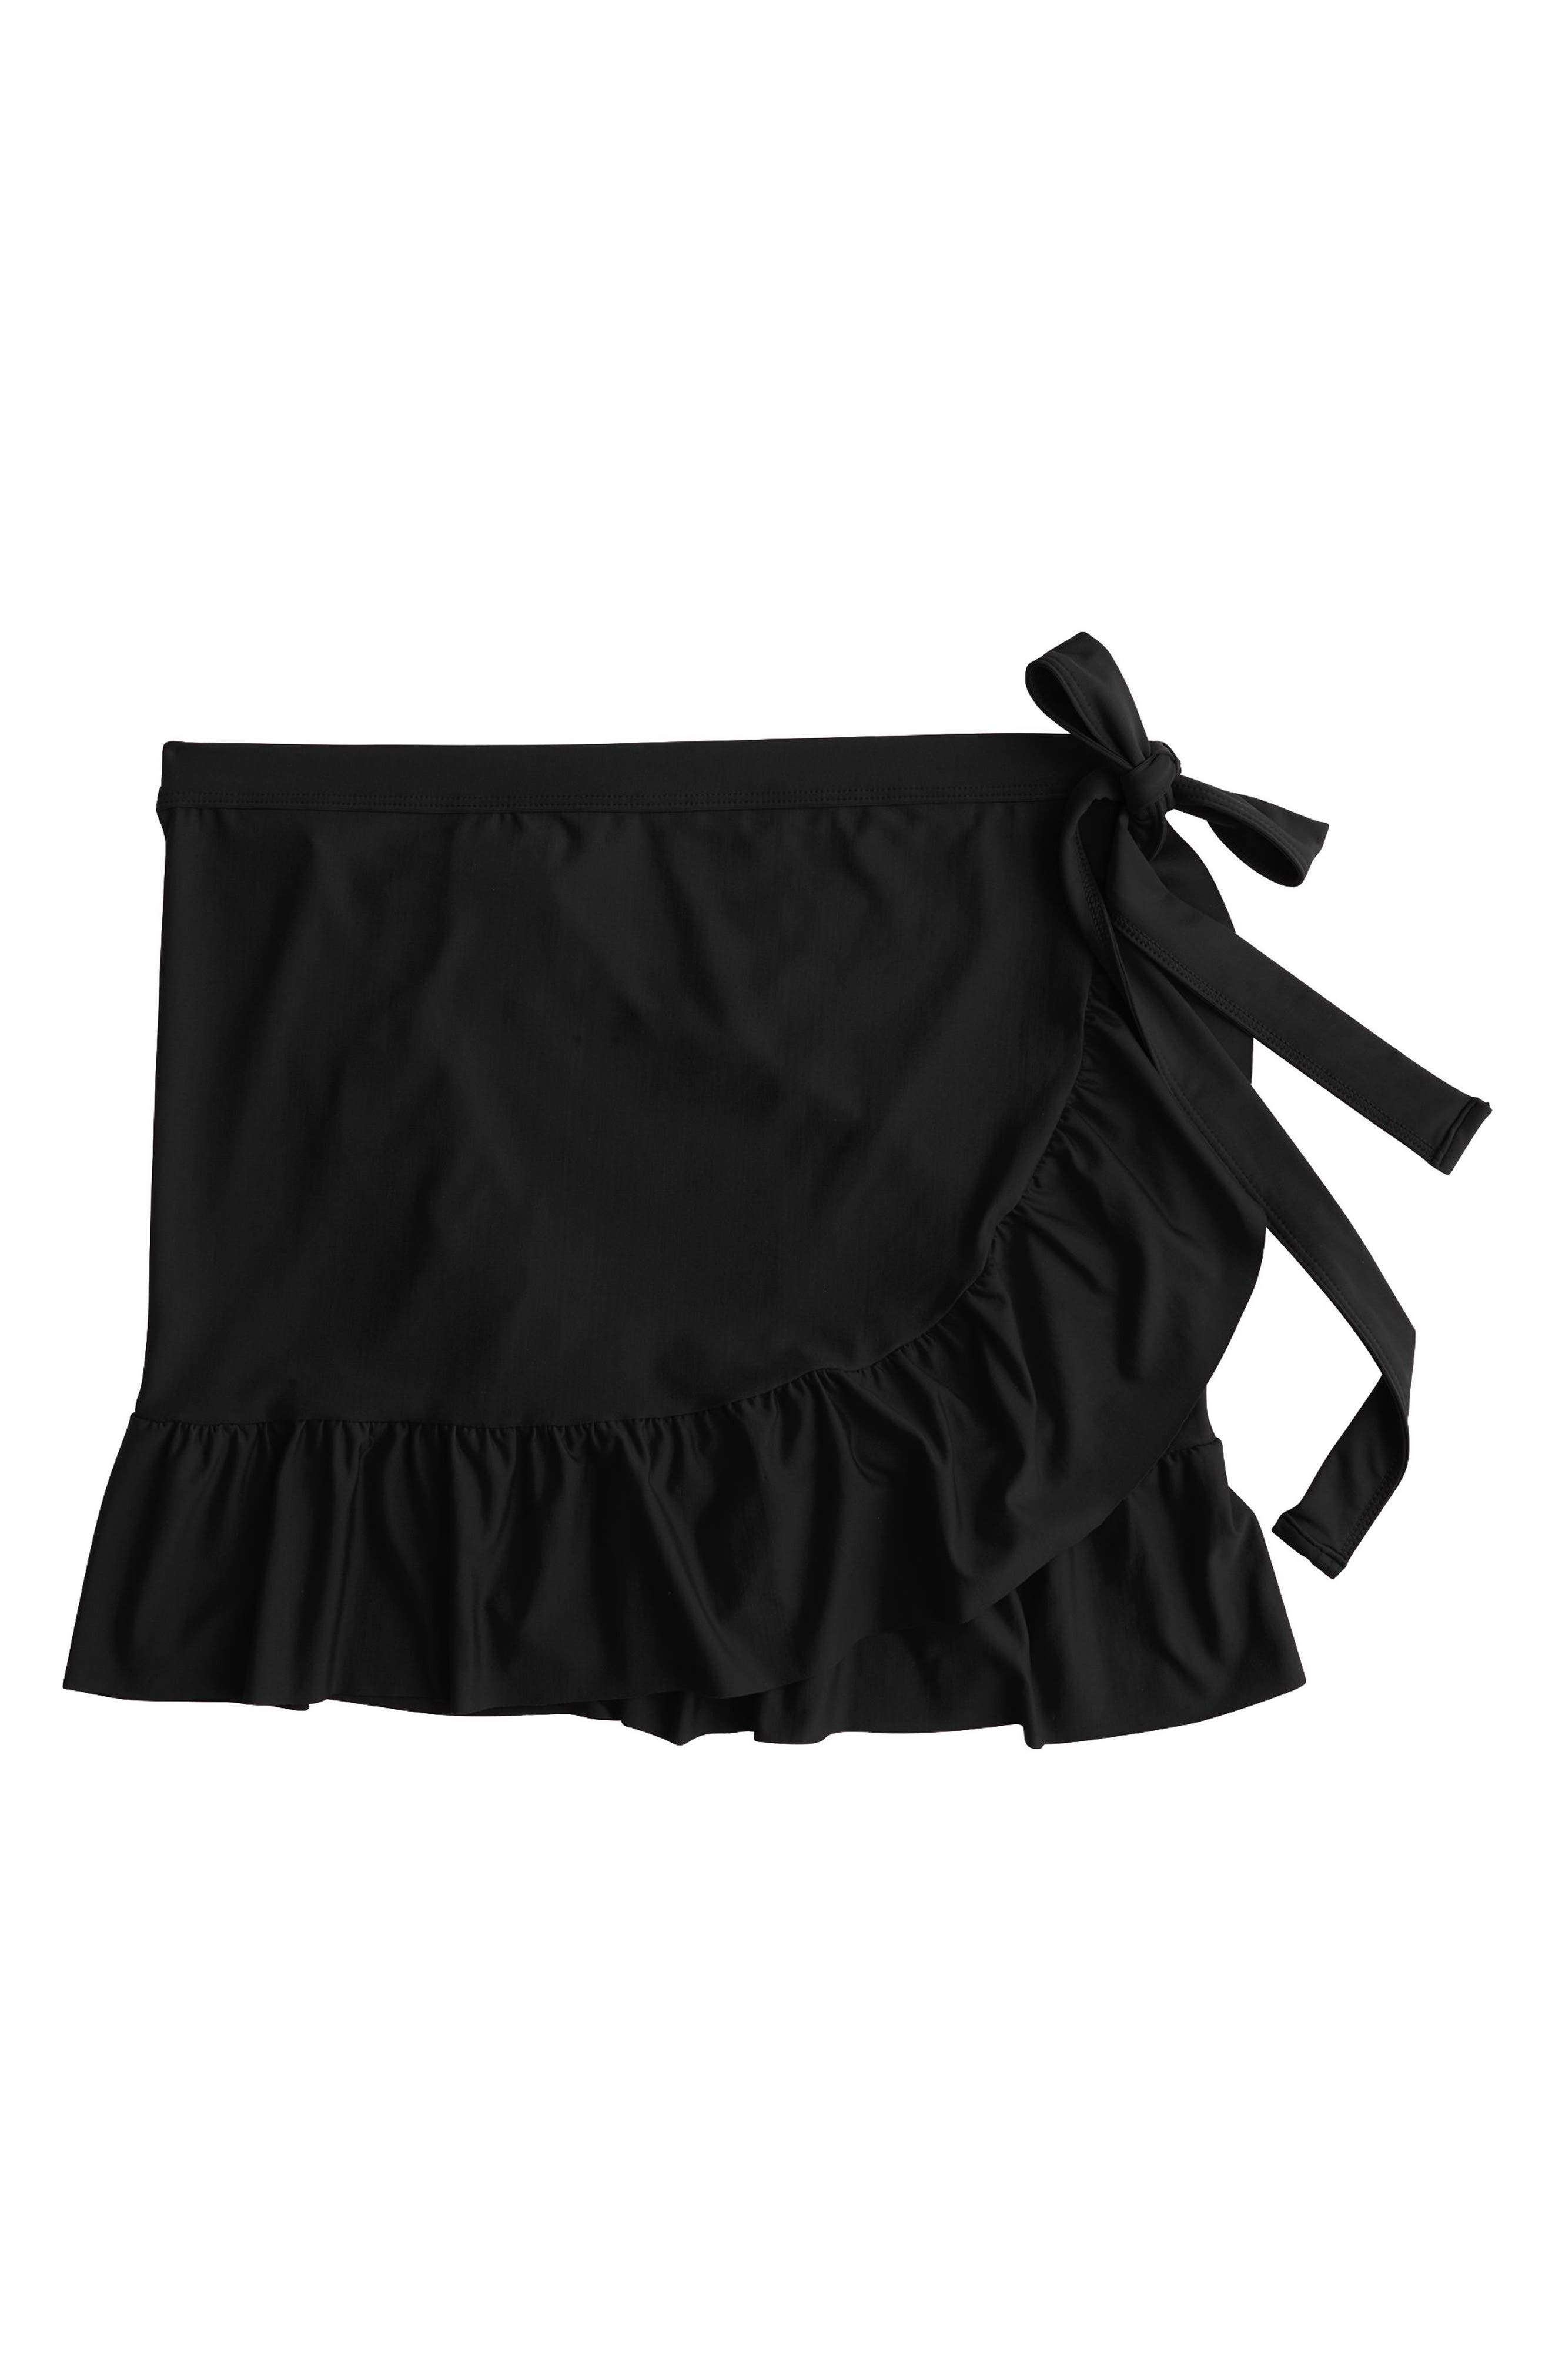 J.CREW,                             Cover-Up Wrap Skirt,                             Alternate thumbnail 6, color,                             001